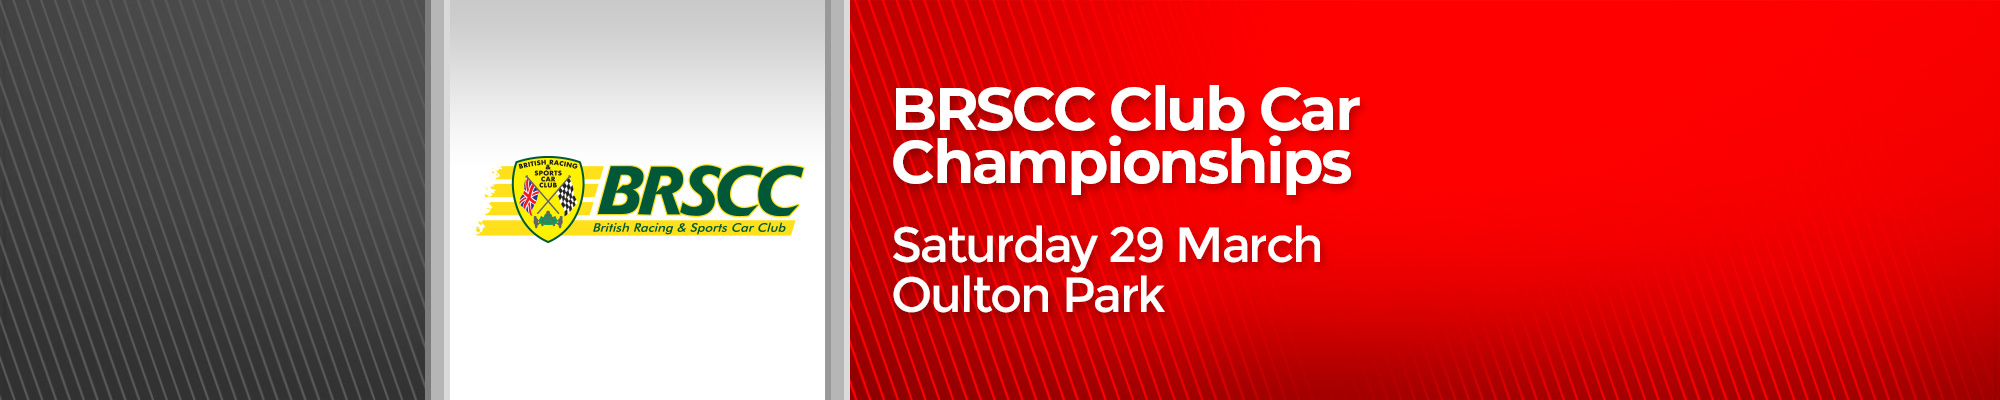 BRSCC Fun Cup Race Day - POSTPONED